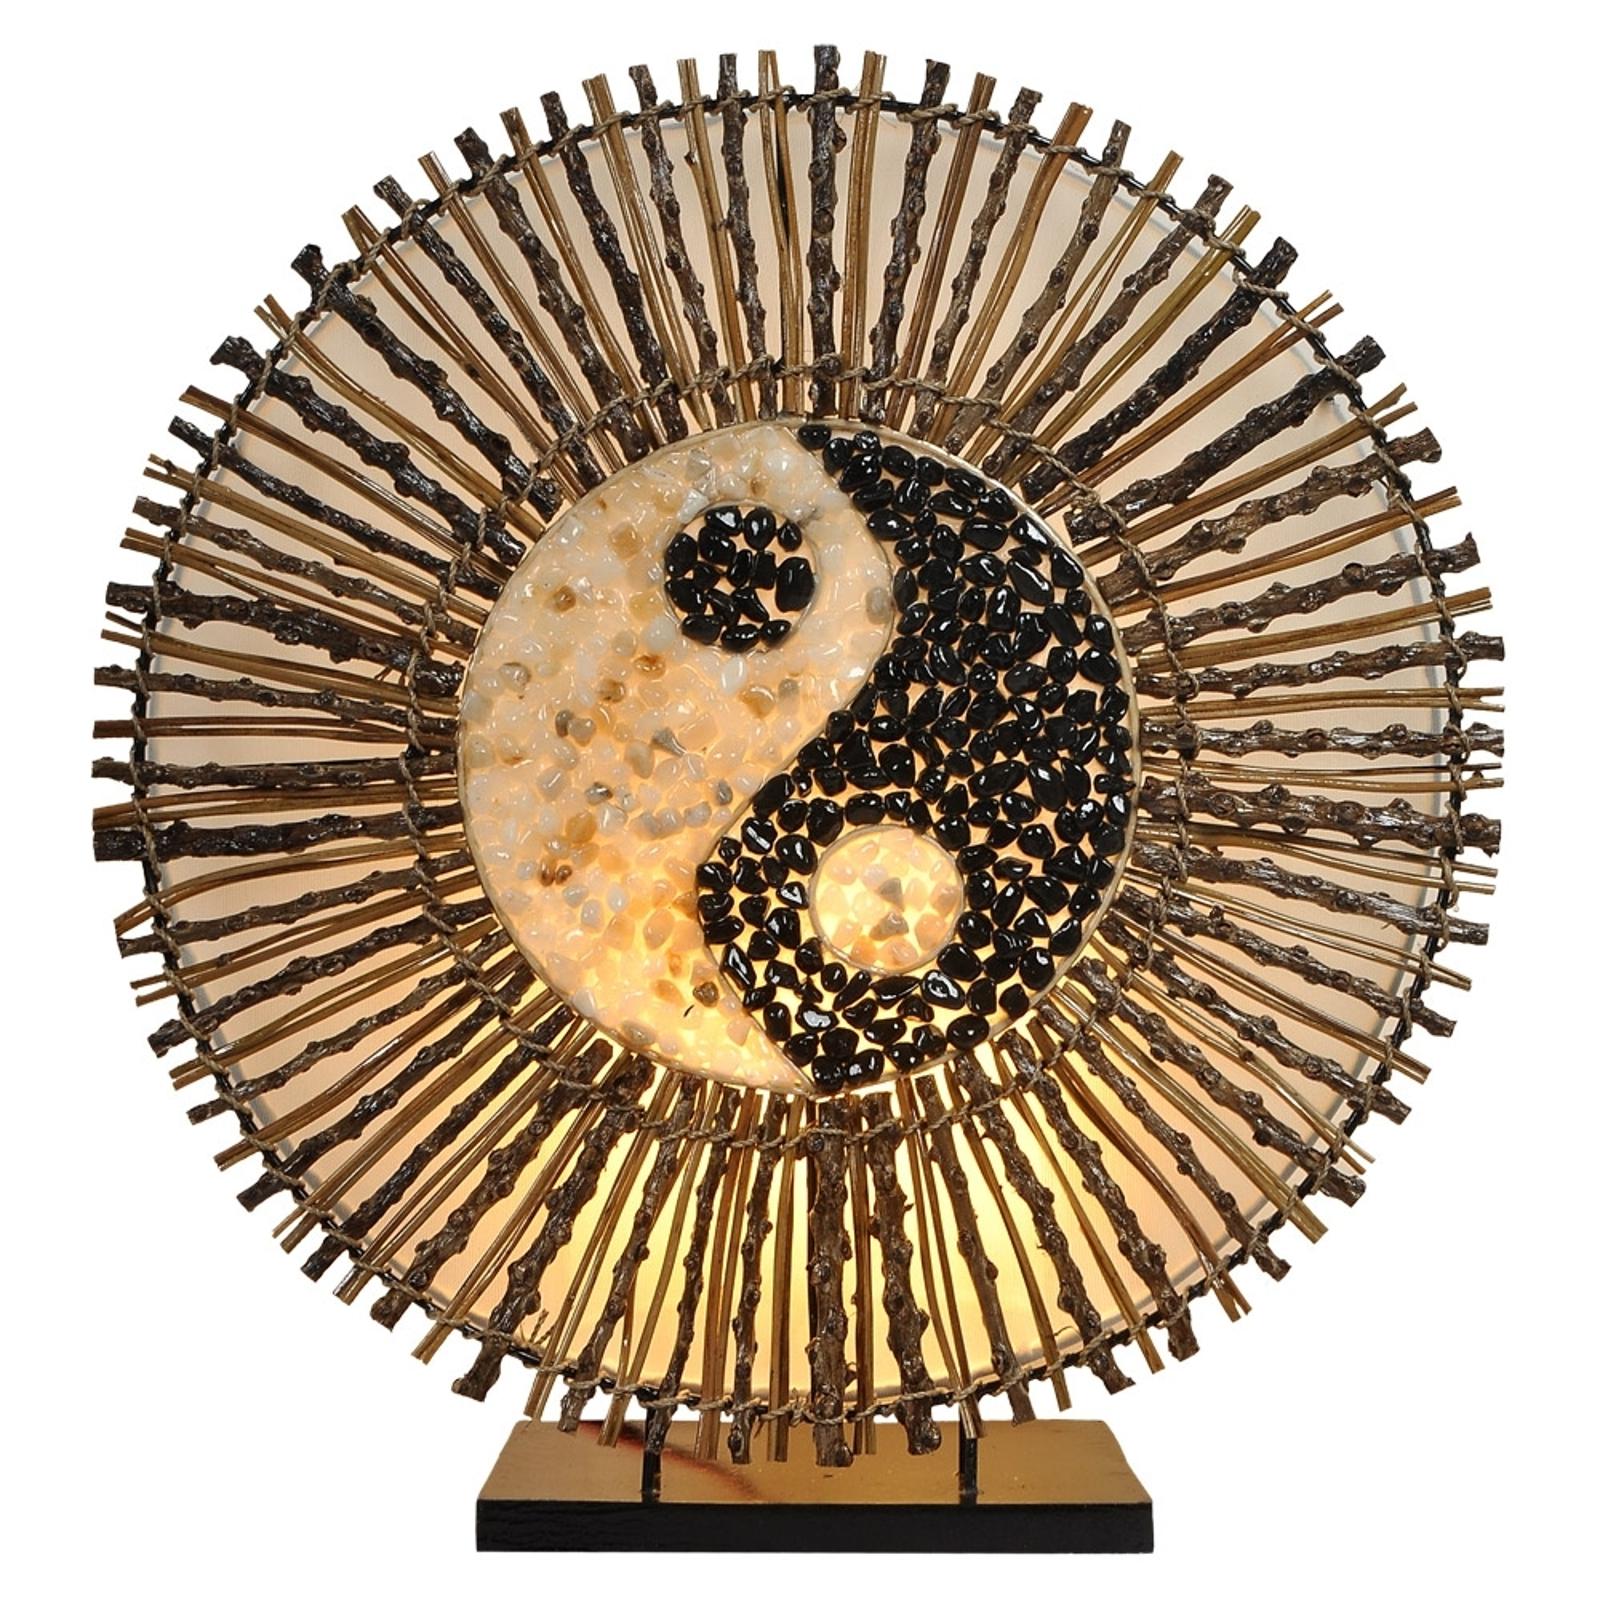 Stolná lampa Ying Yang Batur okrúhla 40cm hnedá_9655155_1